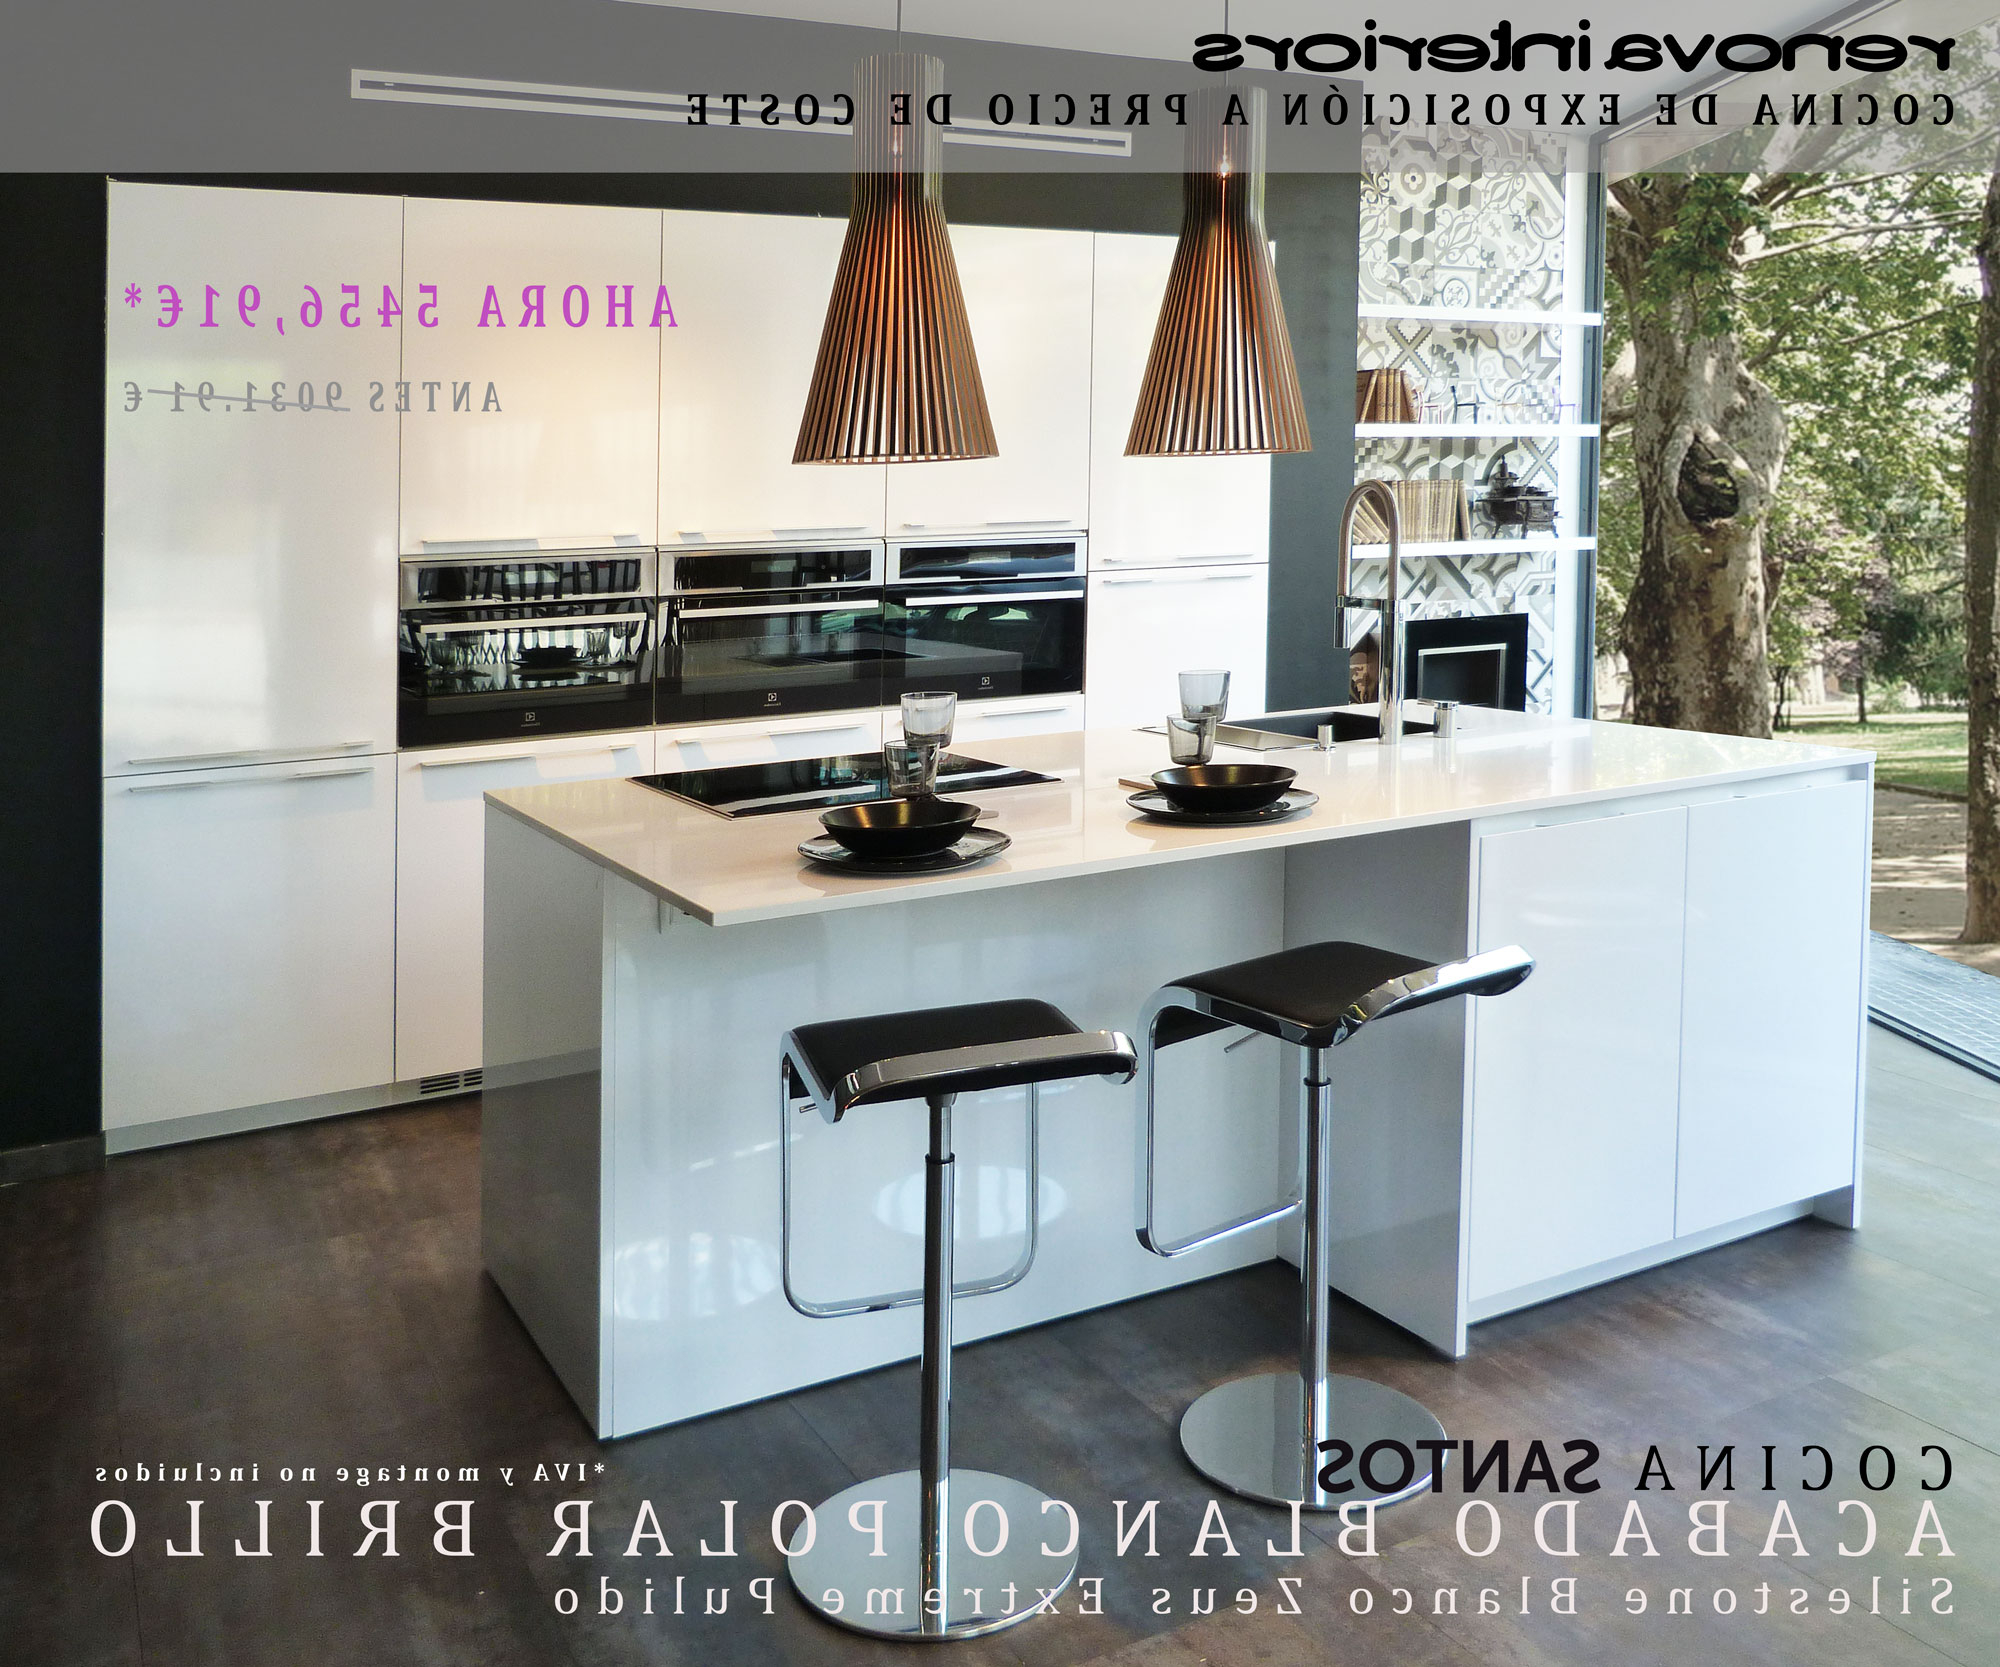 Muebles De Cocina De Exposicion Q5df Cocina De Exposicià N En Oferta Renova Interiors